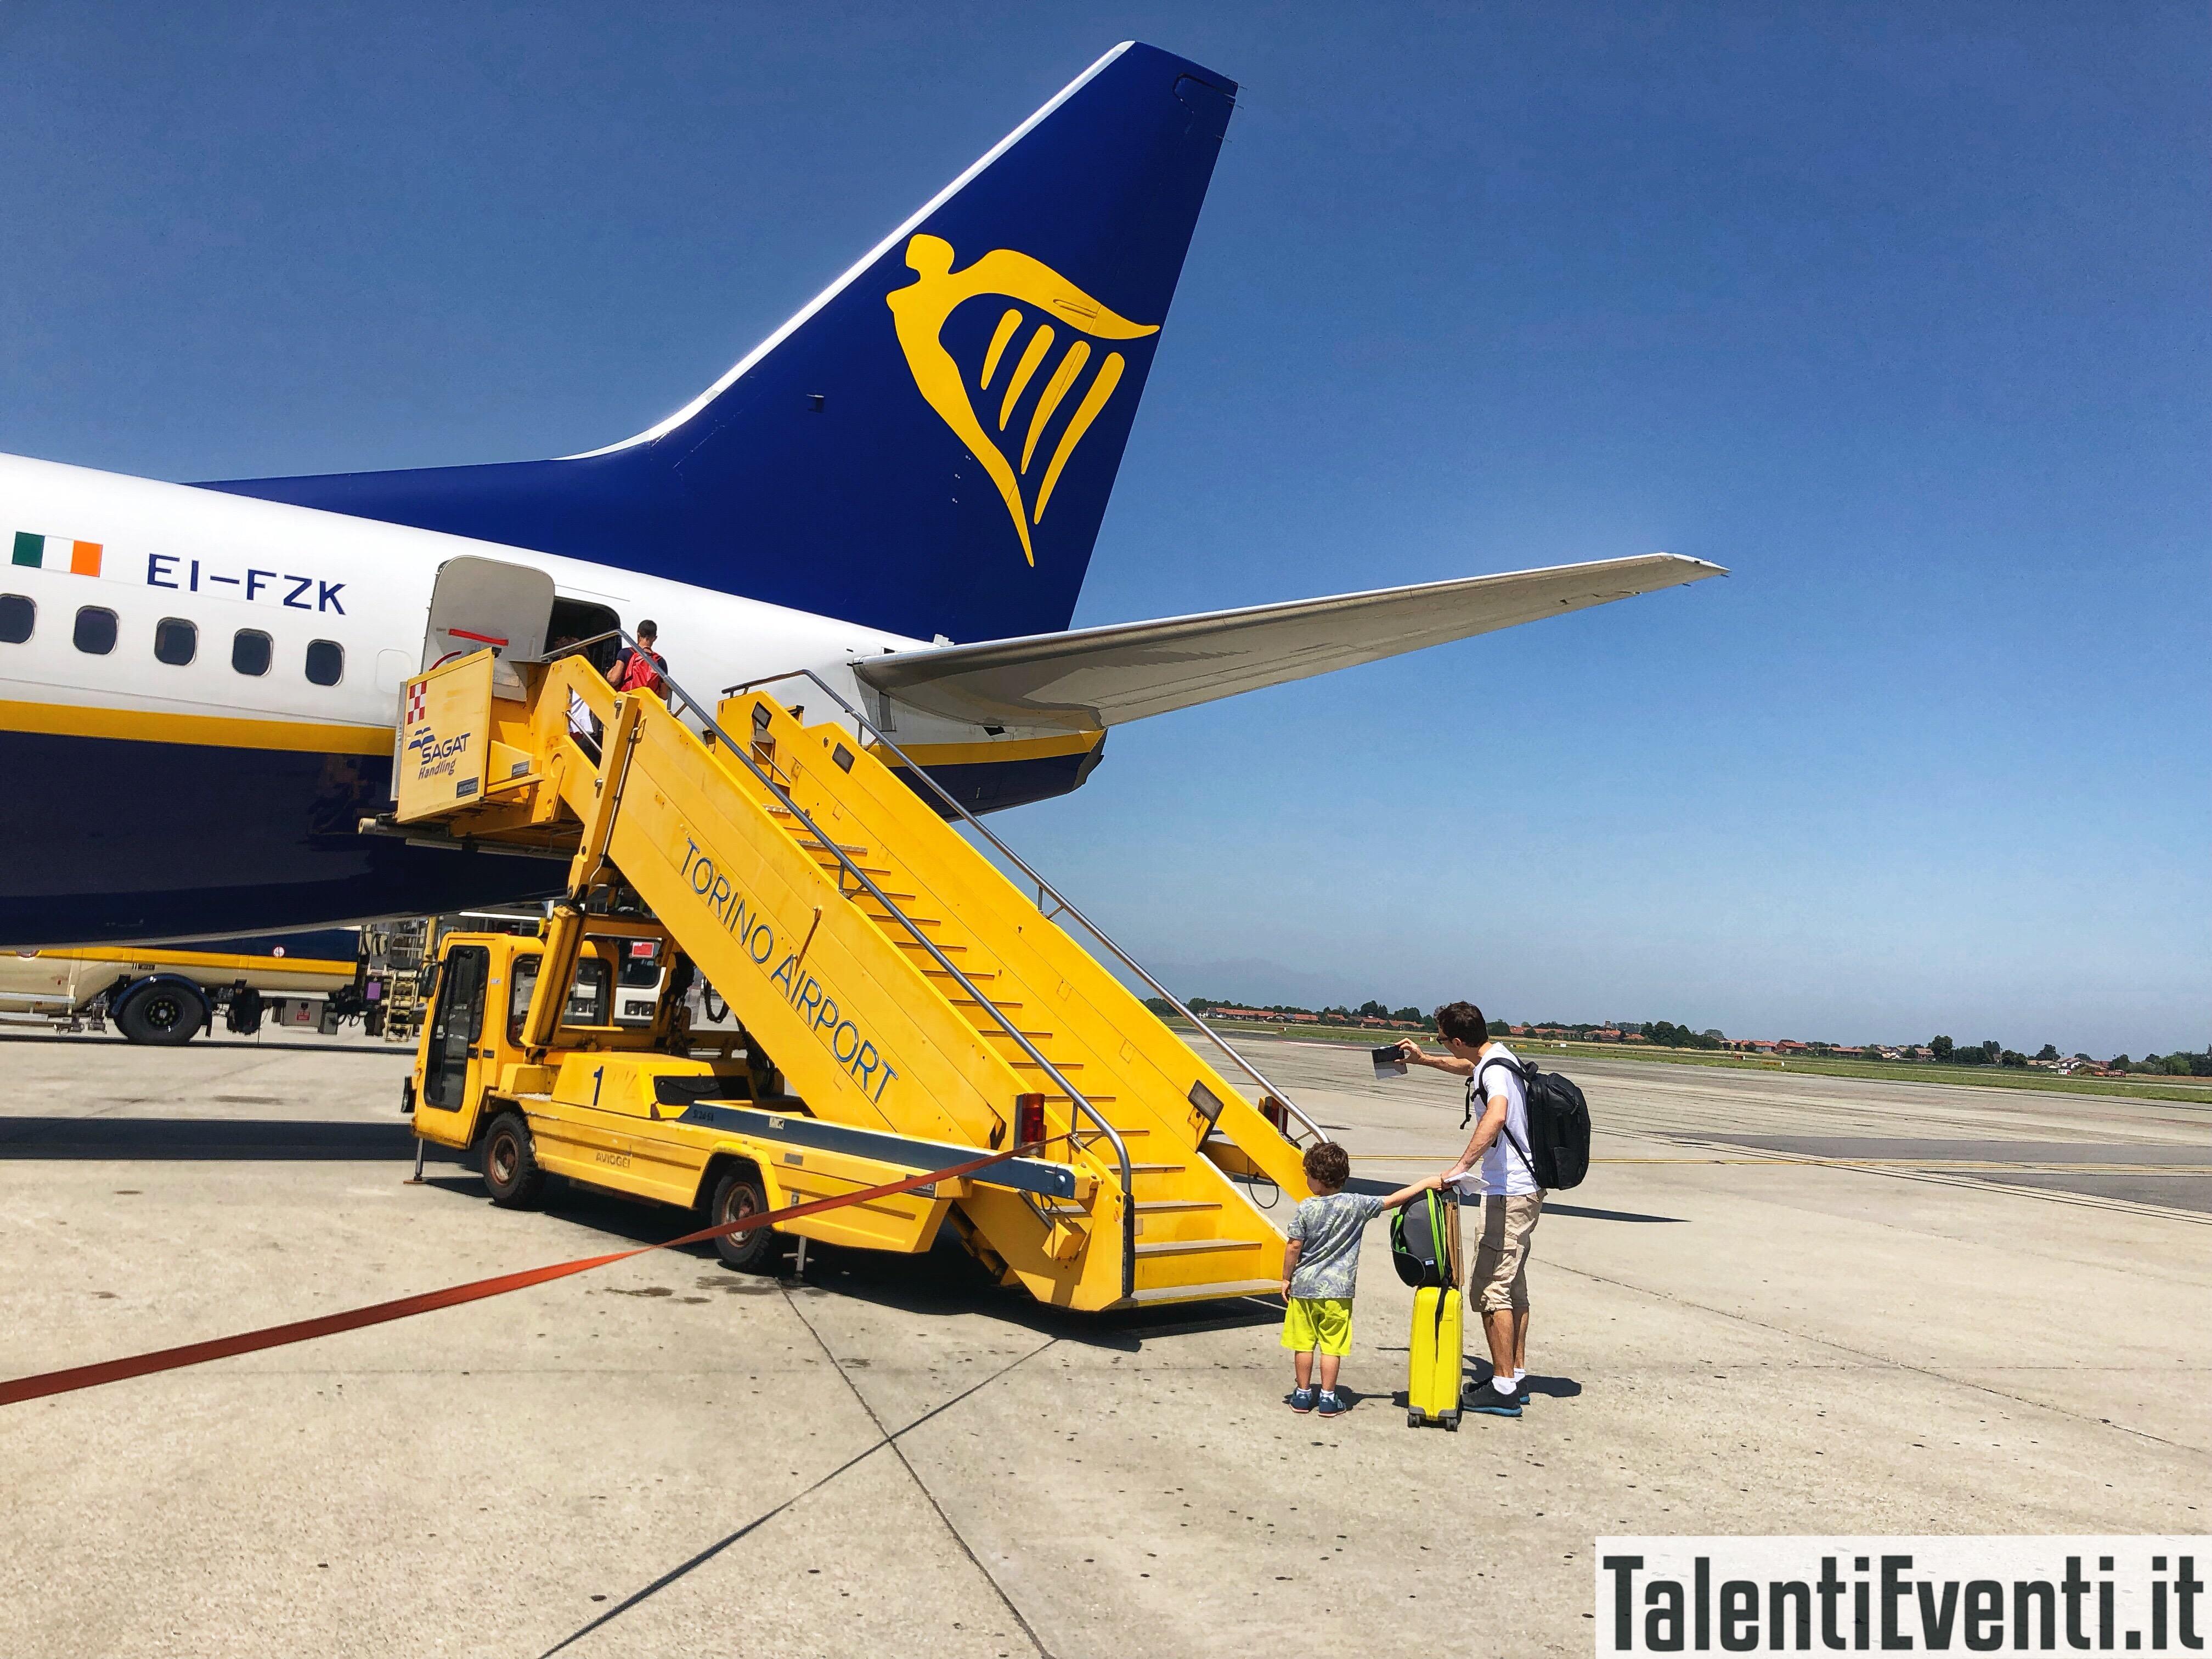 Abbiamo volato con RyanAir da Torino